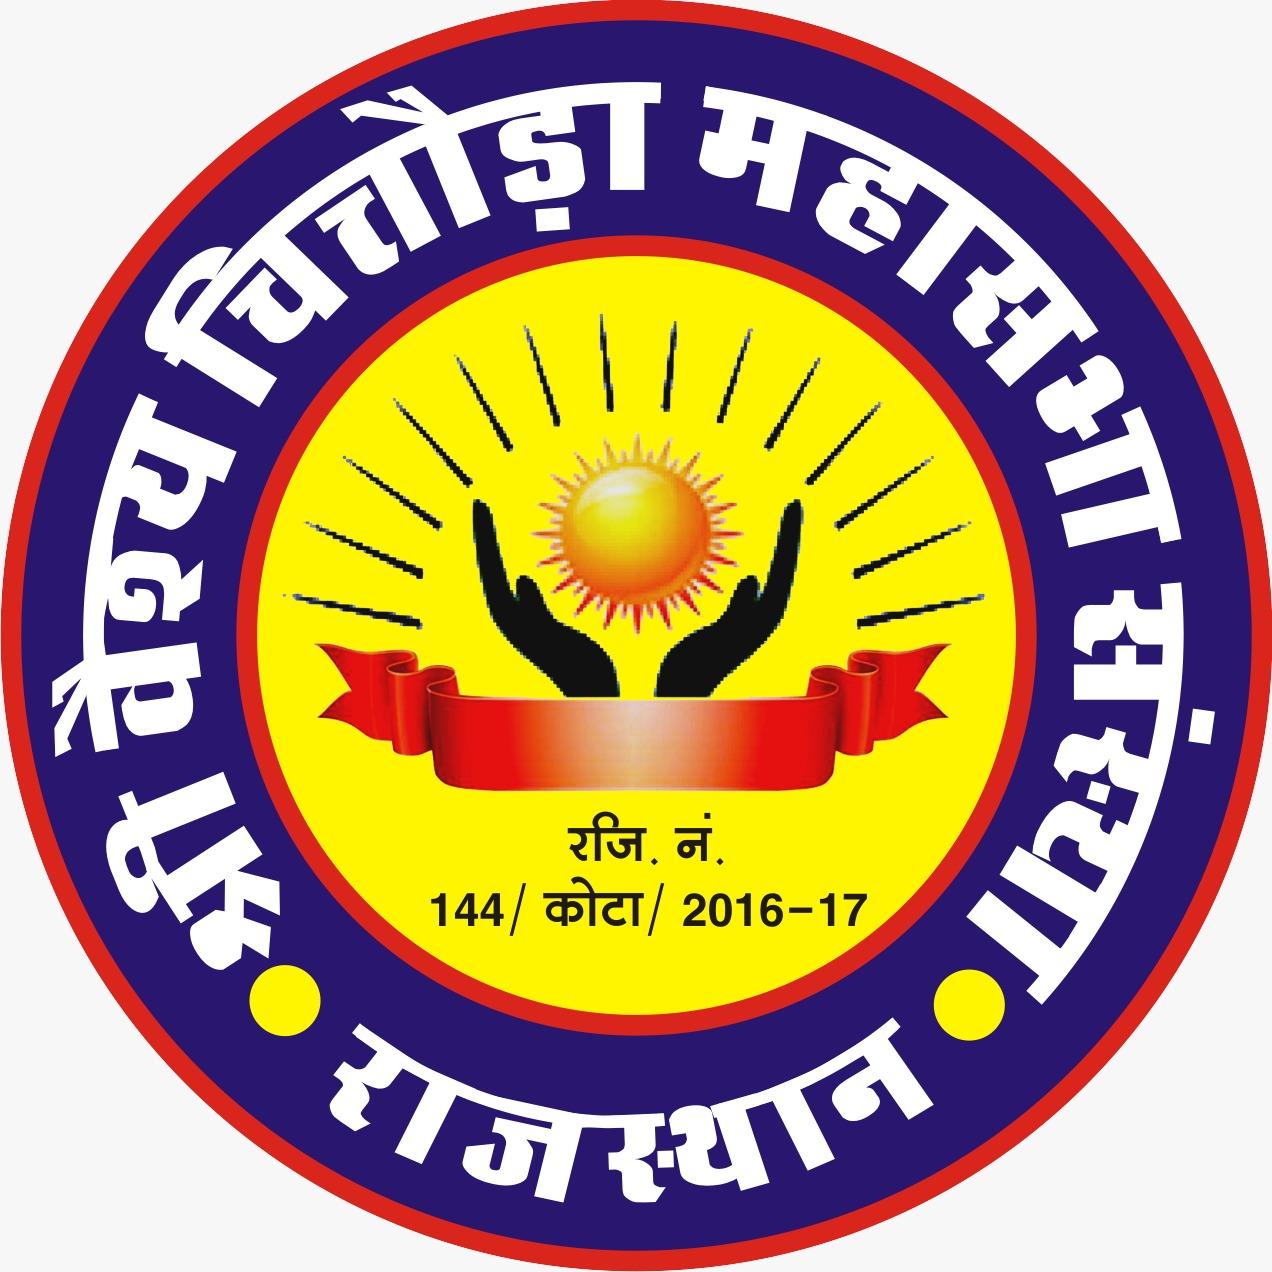 Chittora Samaj